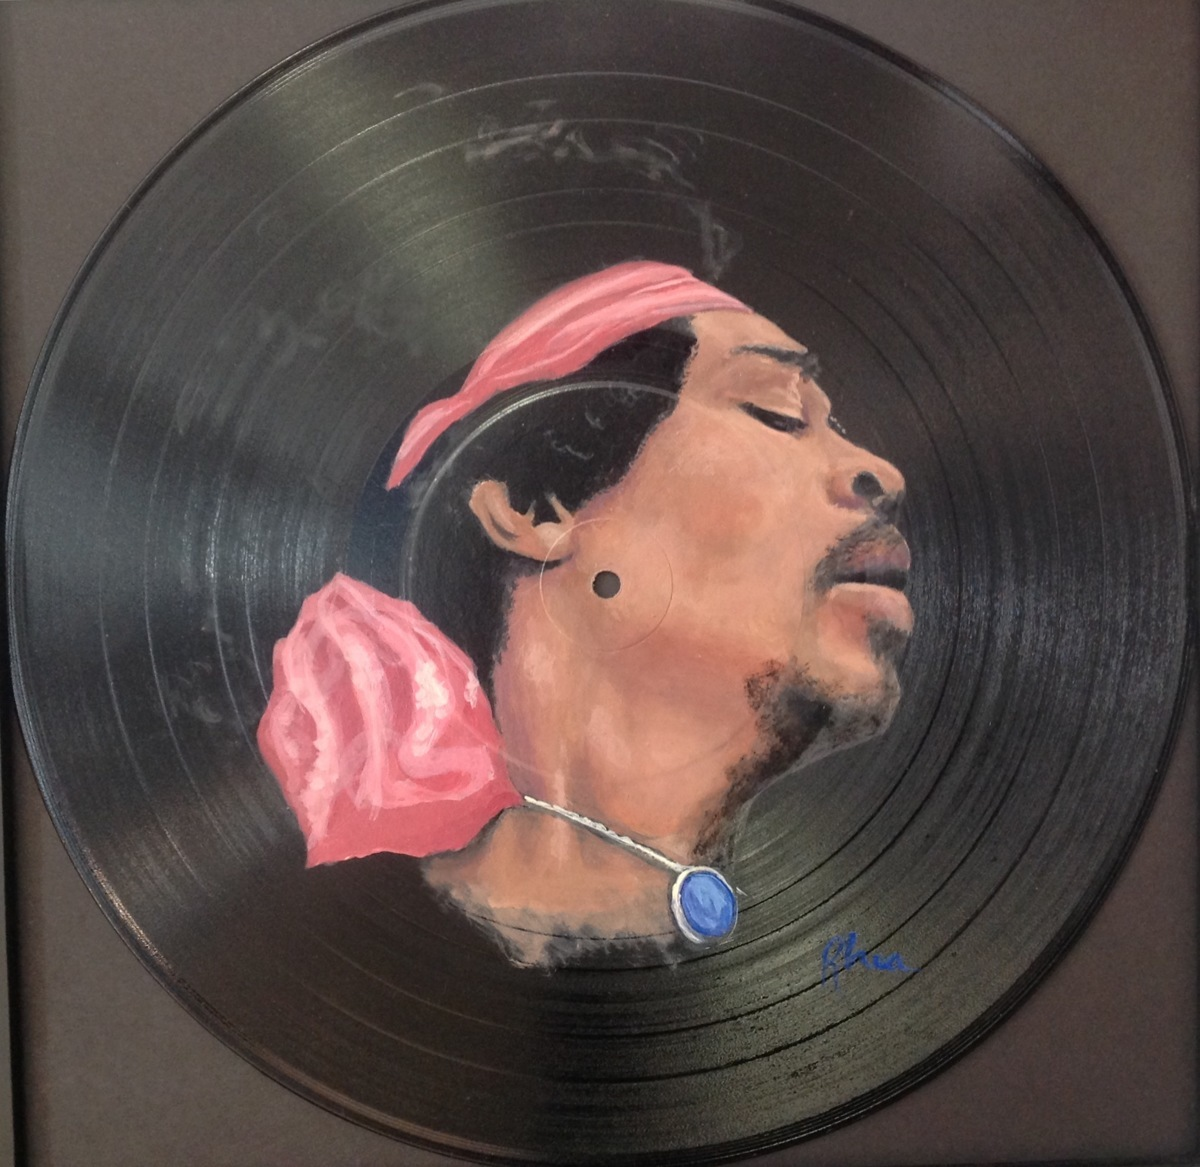 Jimi Hendrix (large view)